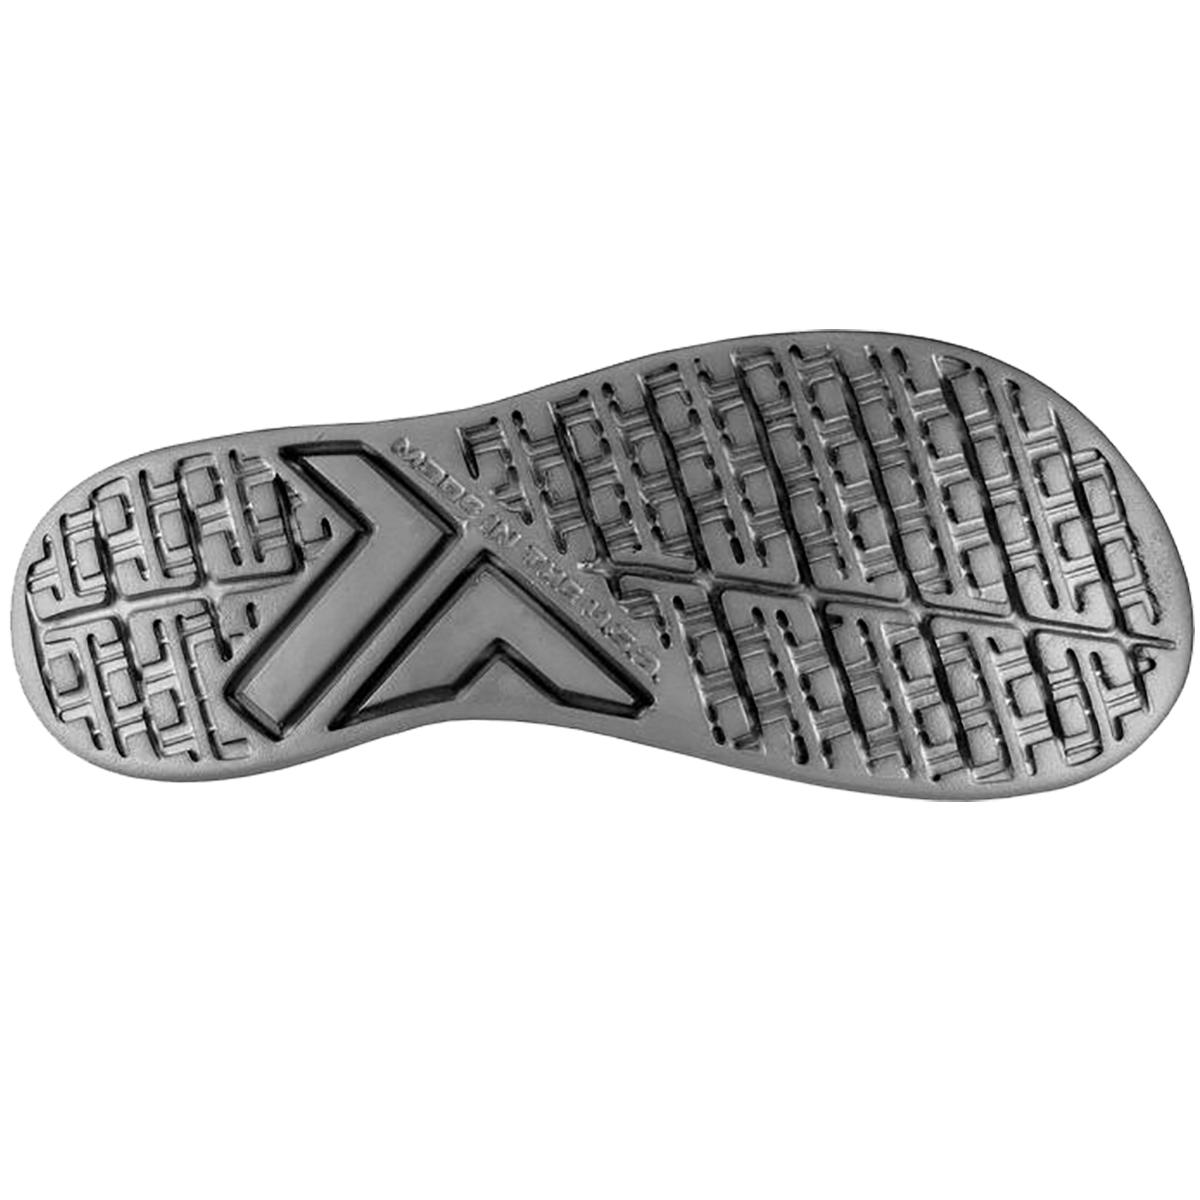 Telic-Unisex-Signature-Style-Arch-Support-Pain-Relief-Flip-Flops thumbnail 18